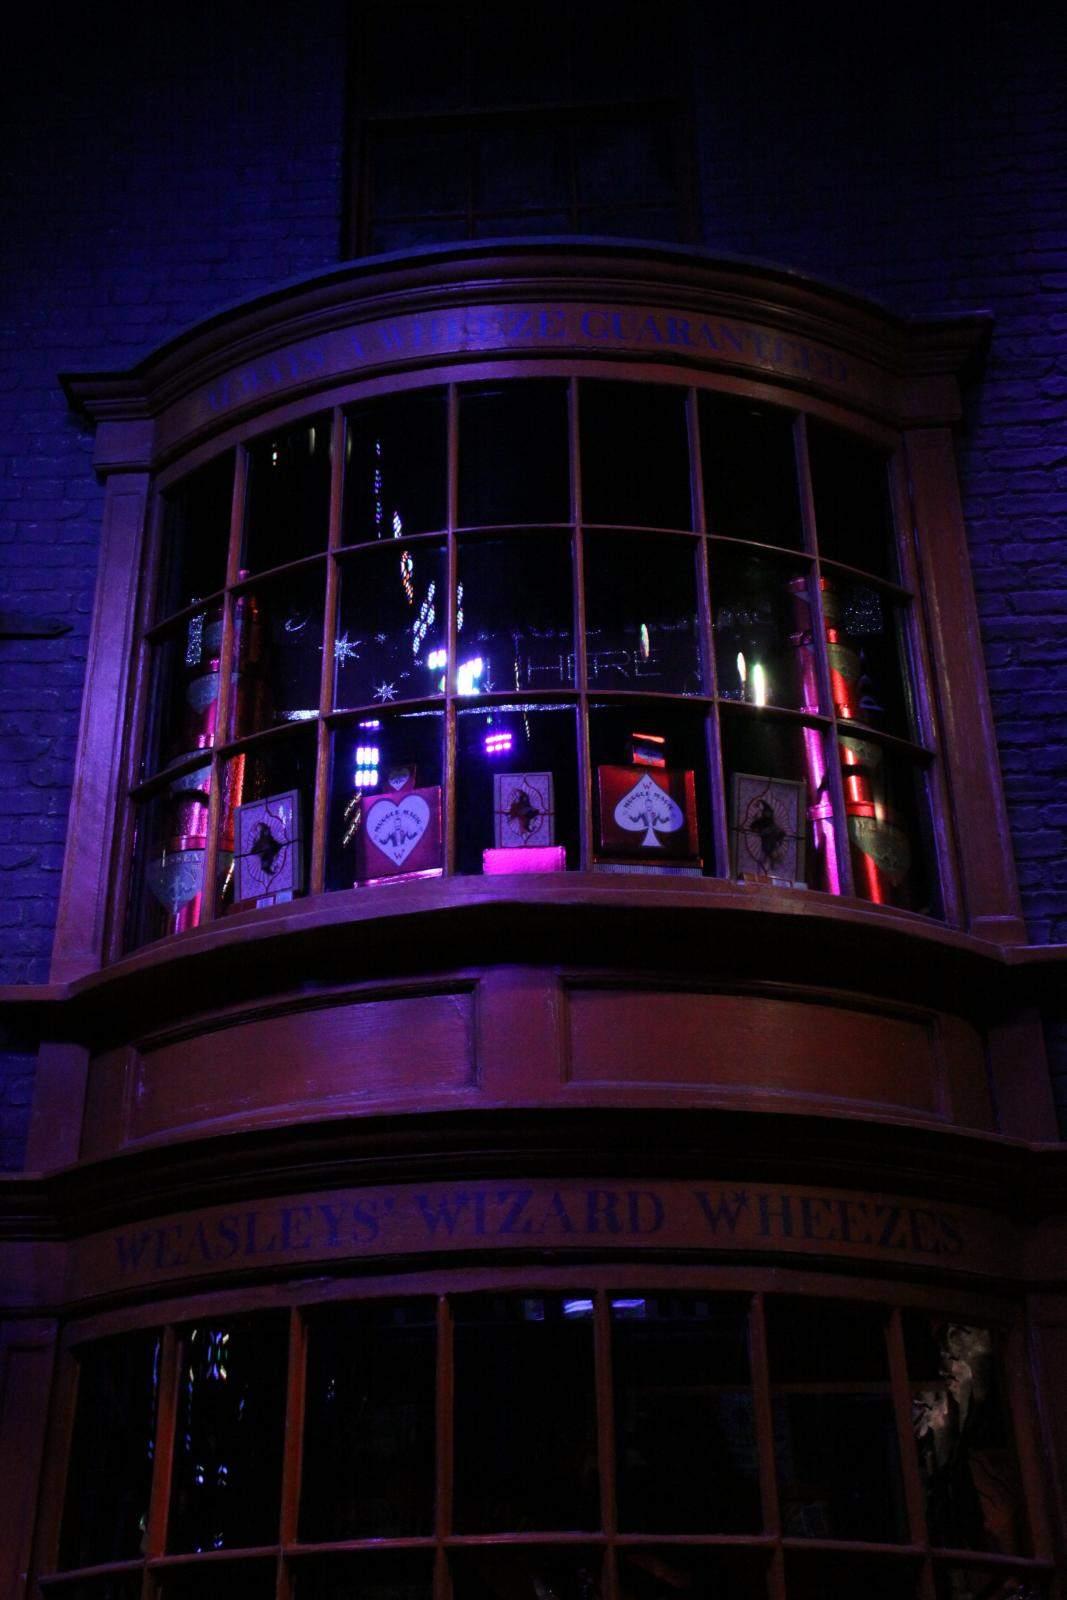 making harry potter4 The Making of Harry Potter, Warner Bros Studio London